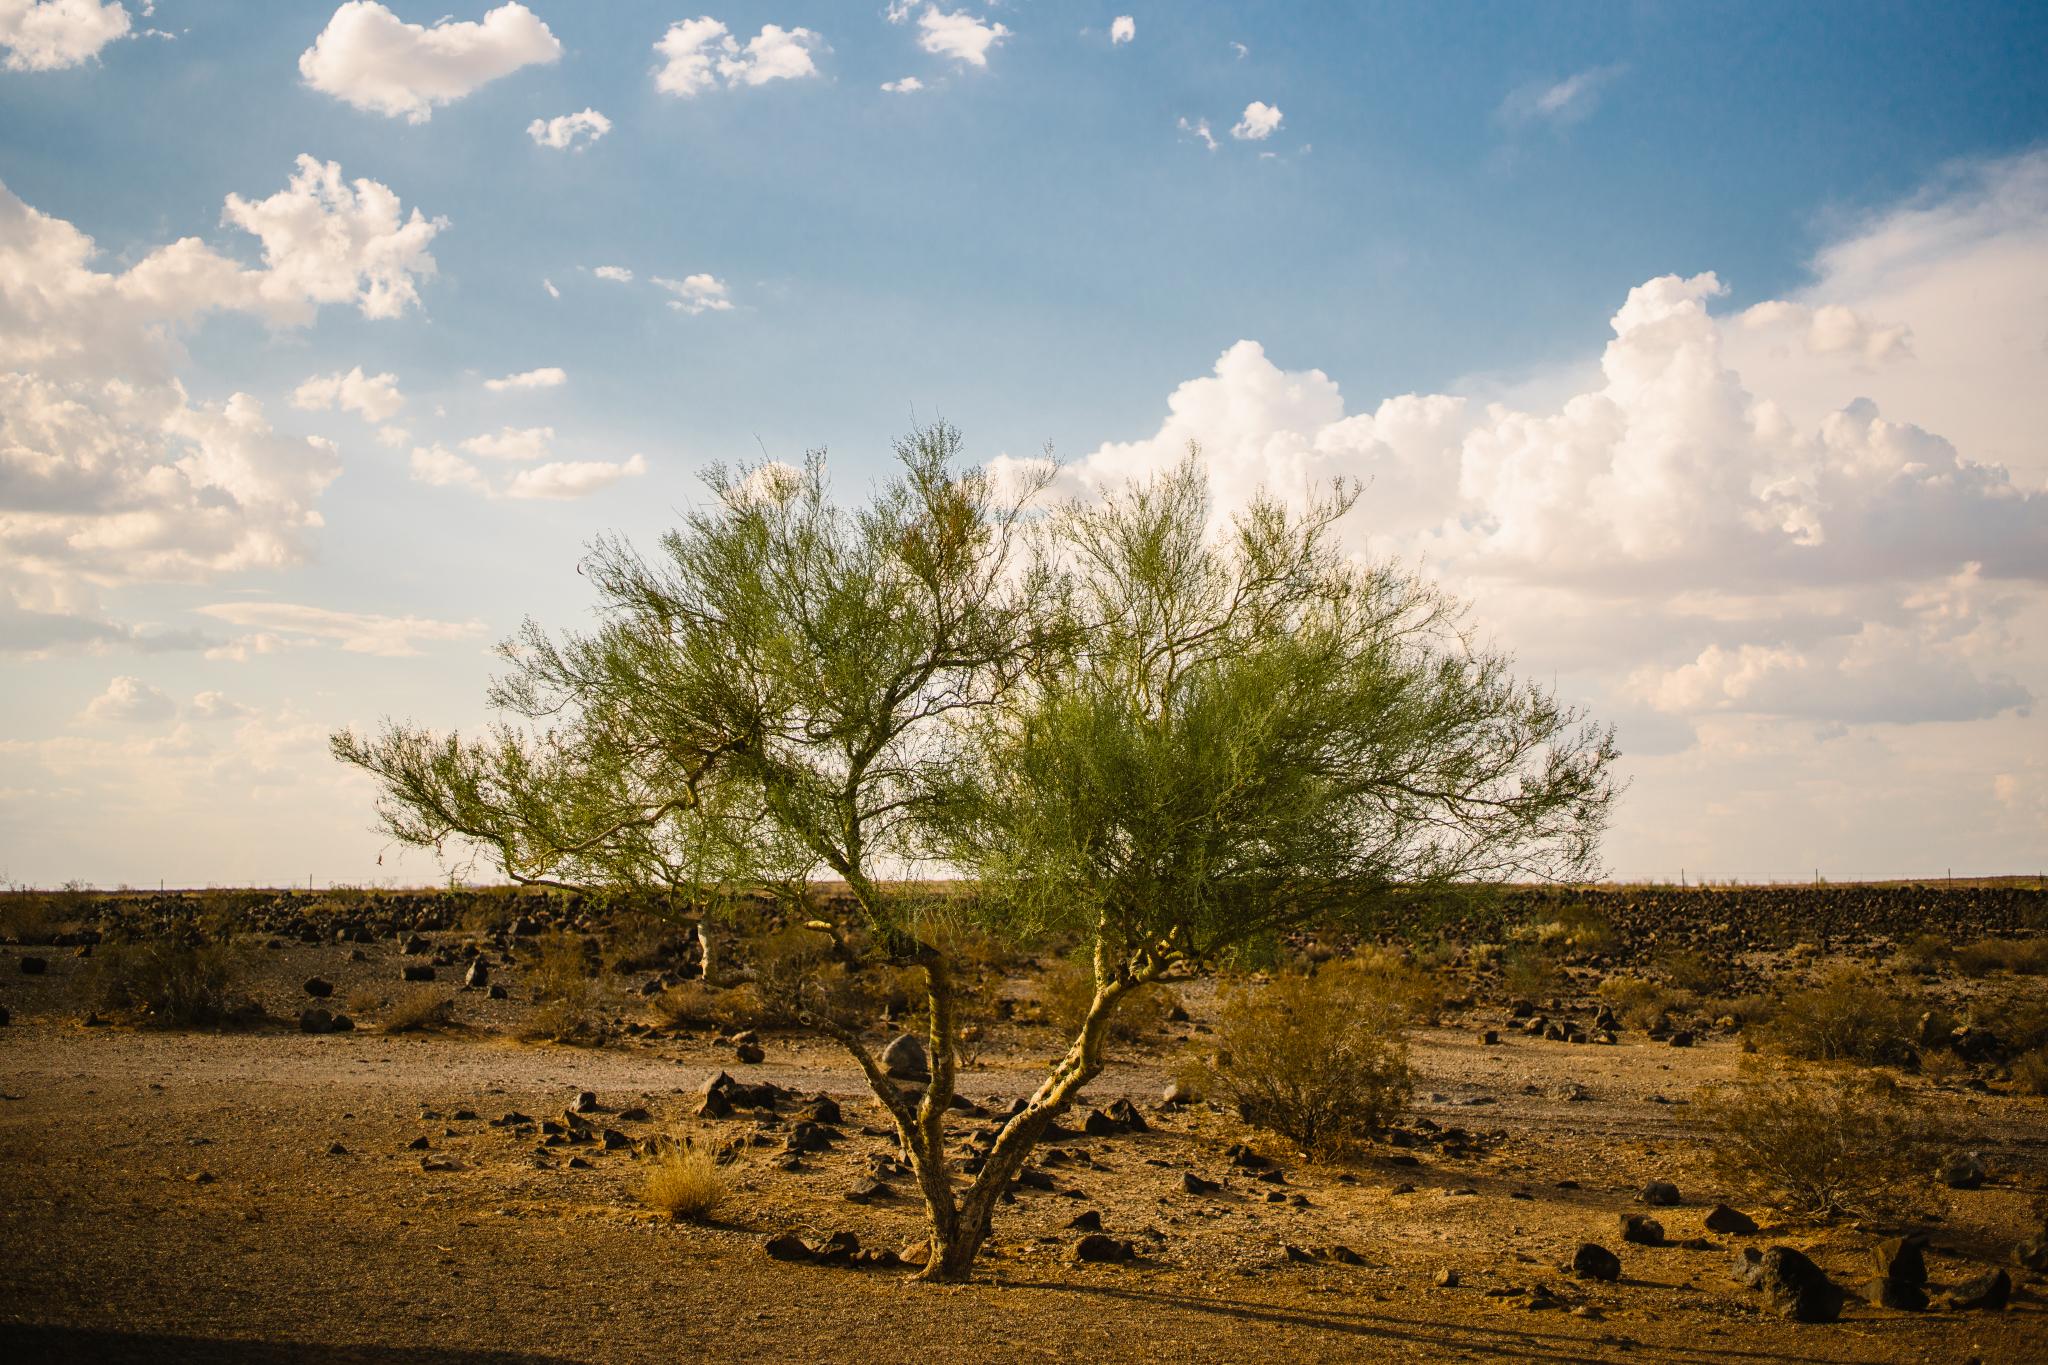 san diego wedding   photographer | lone tree in desert setting